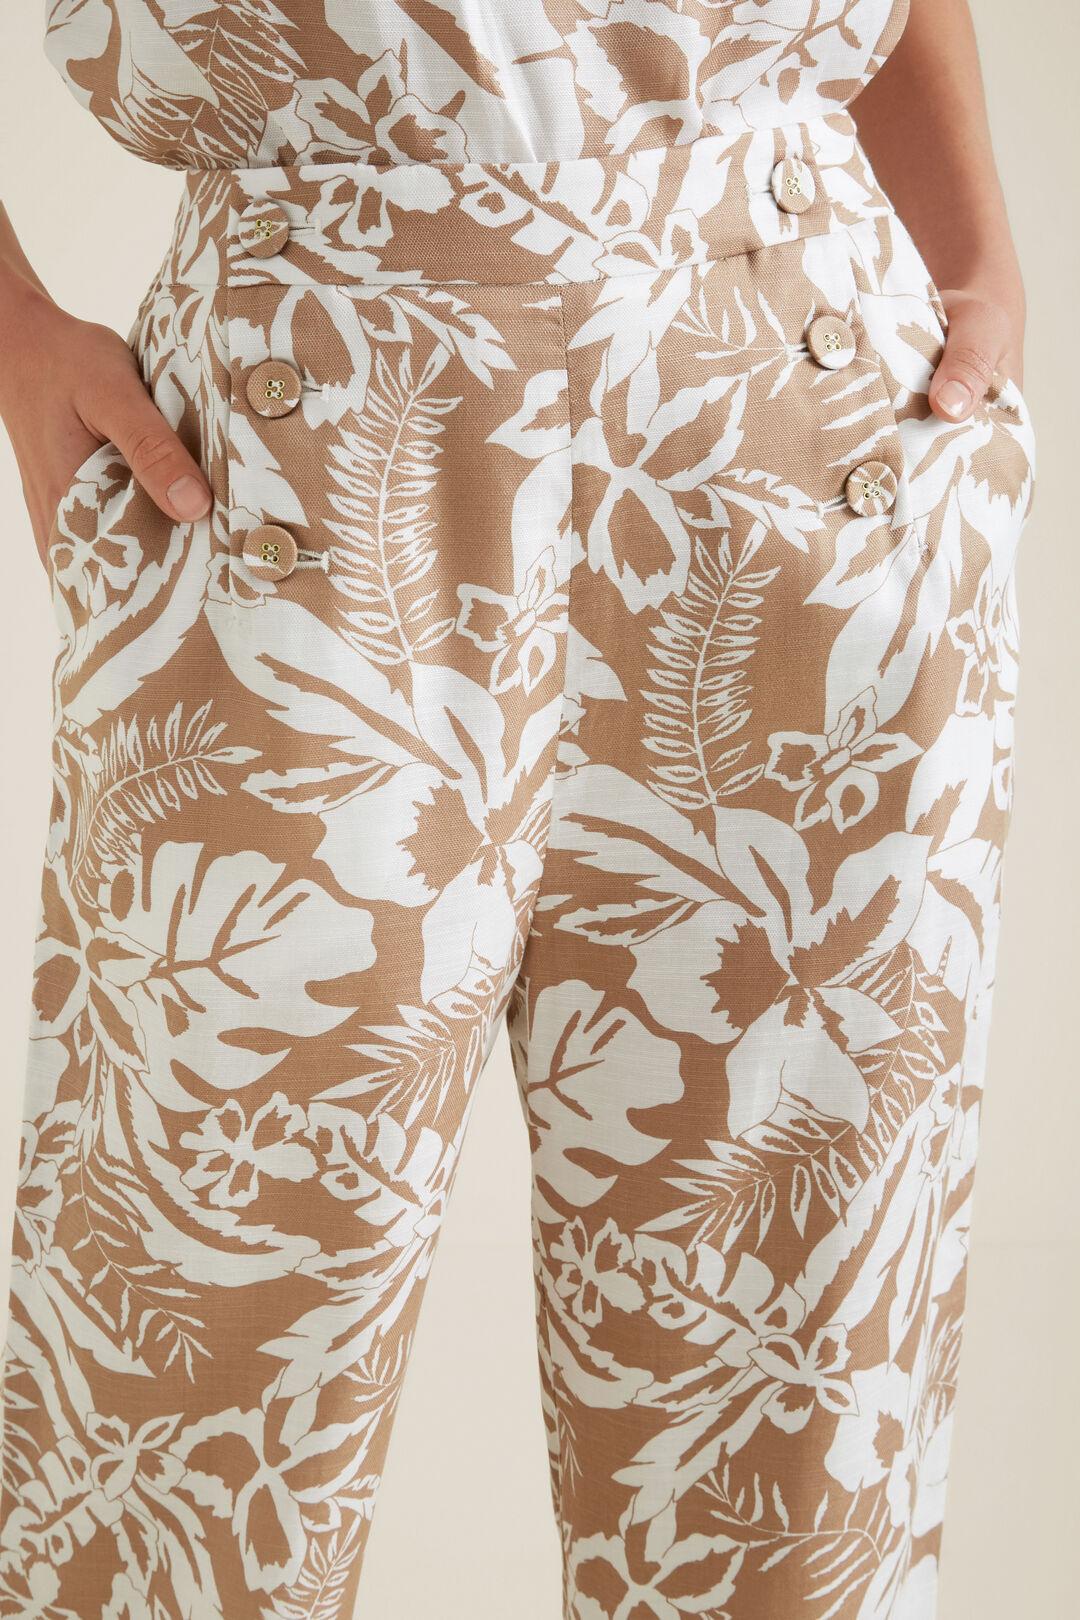 Palm Print Pant  PALM PRINT  hi-res